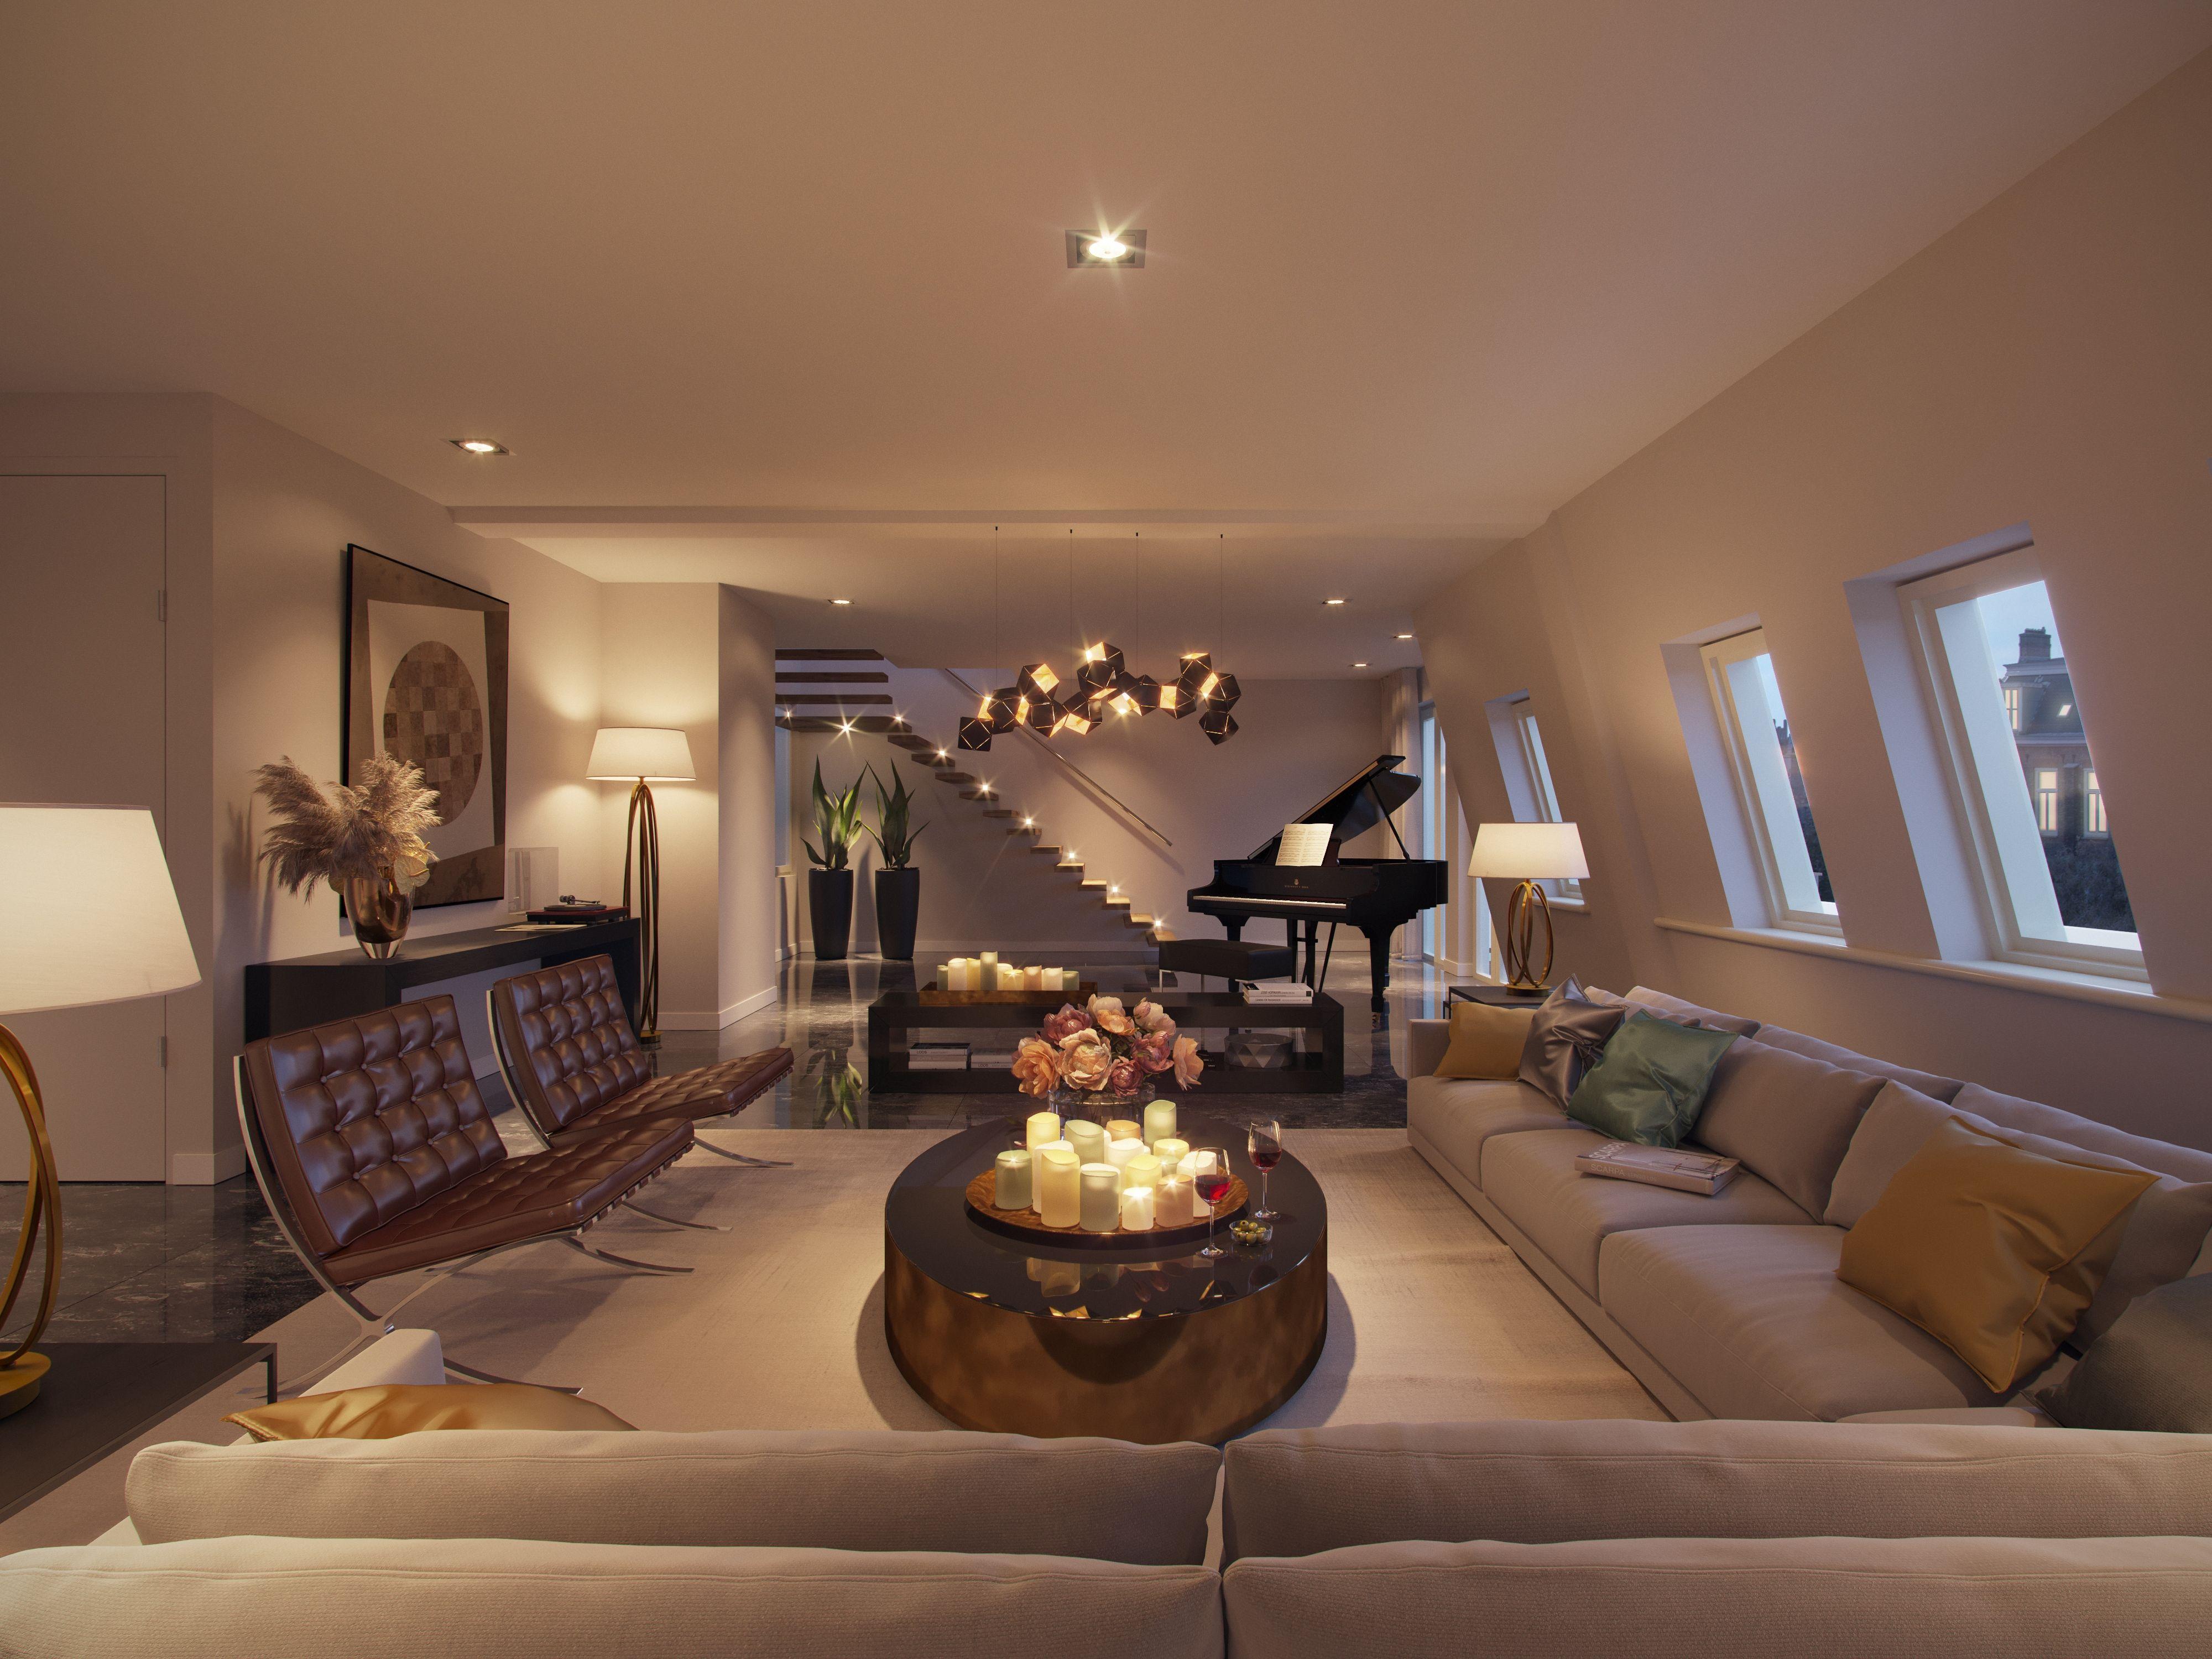 Te koop living spaces pent house home decor interior